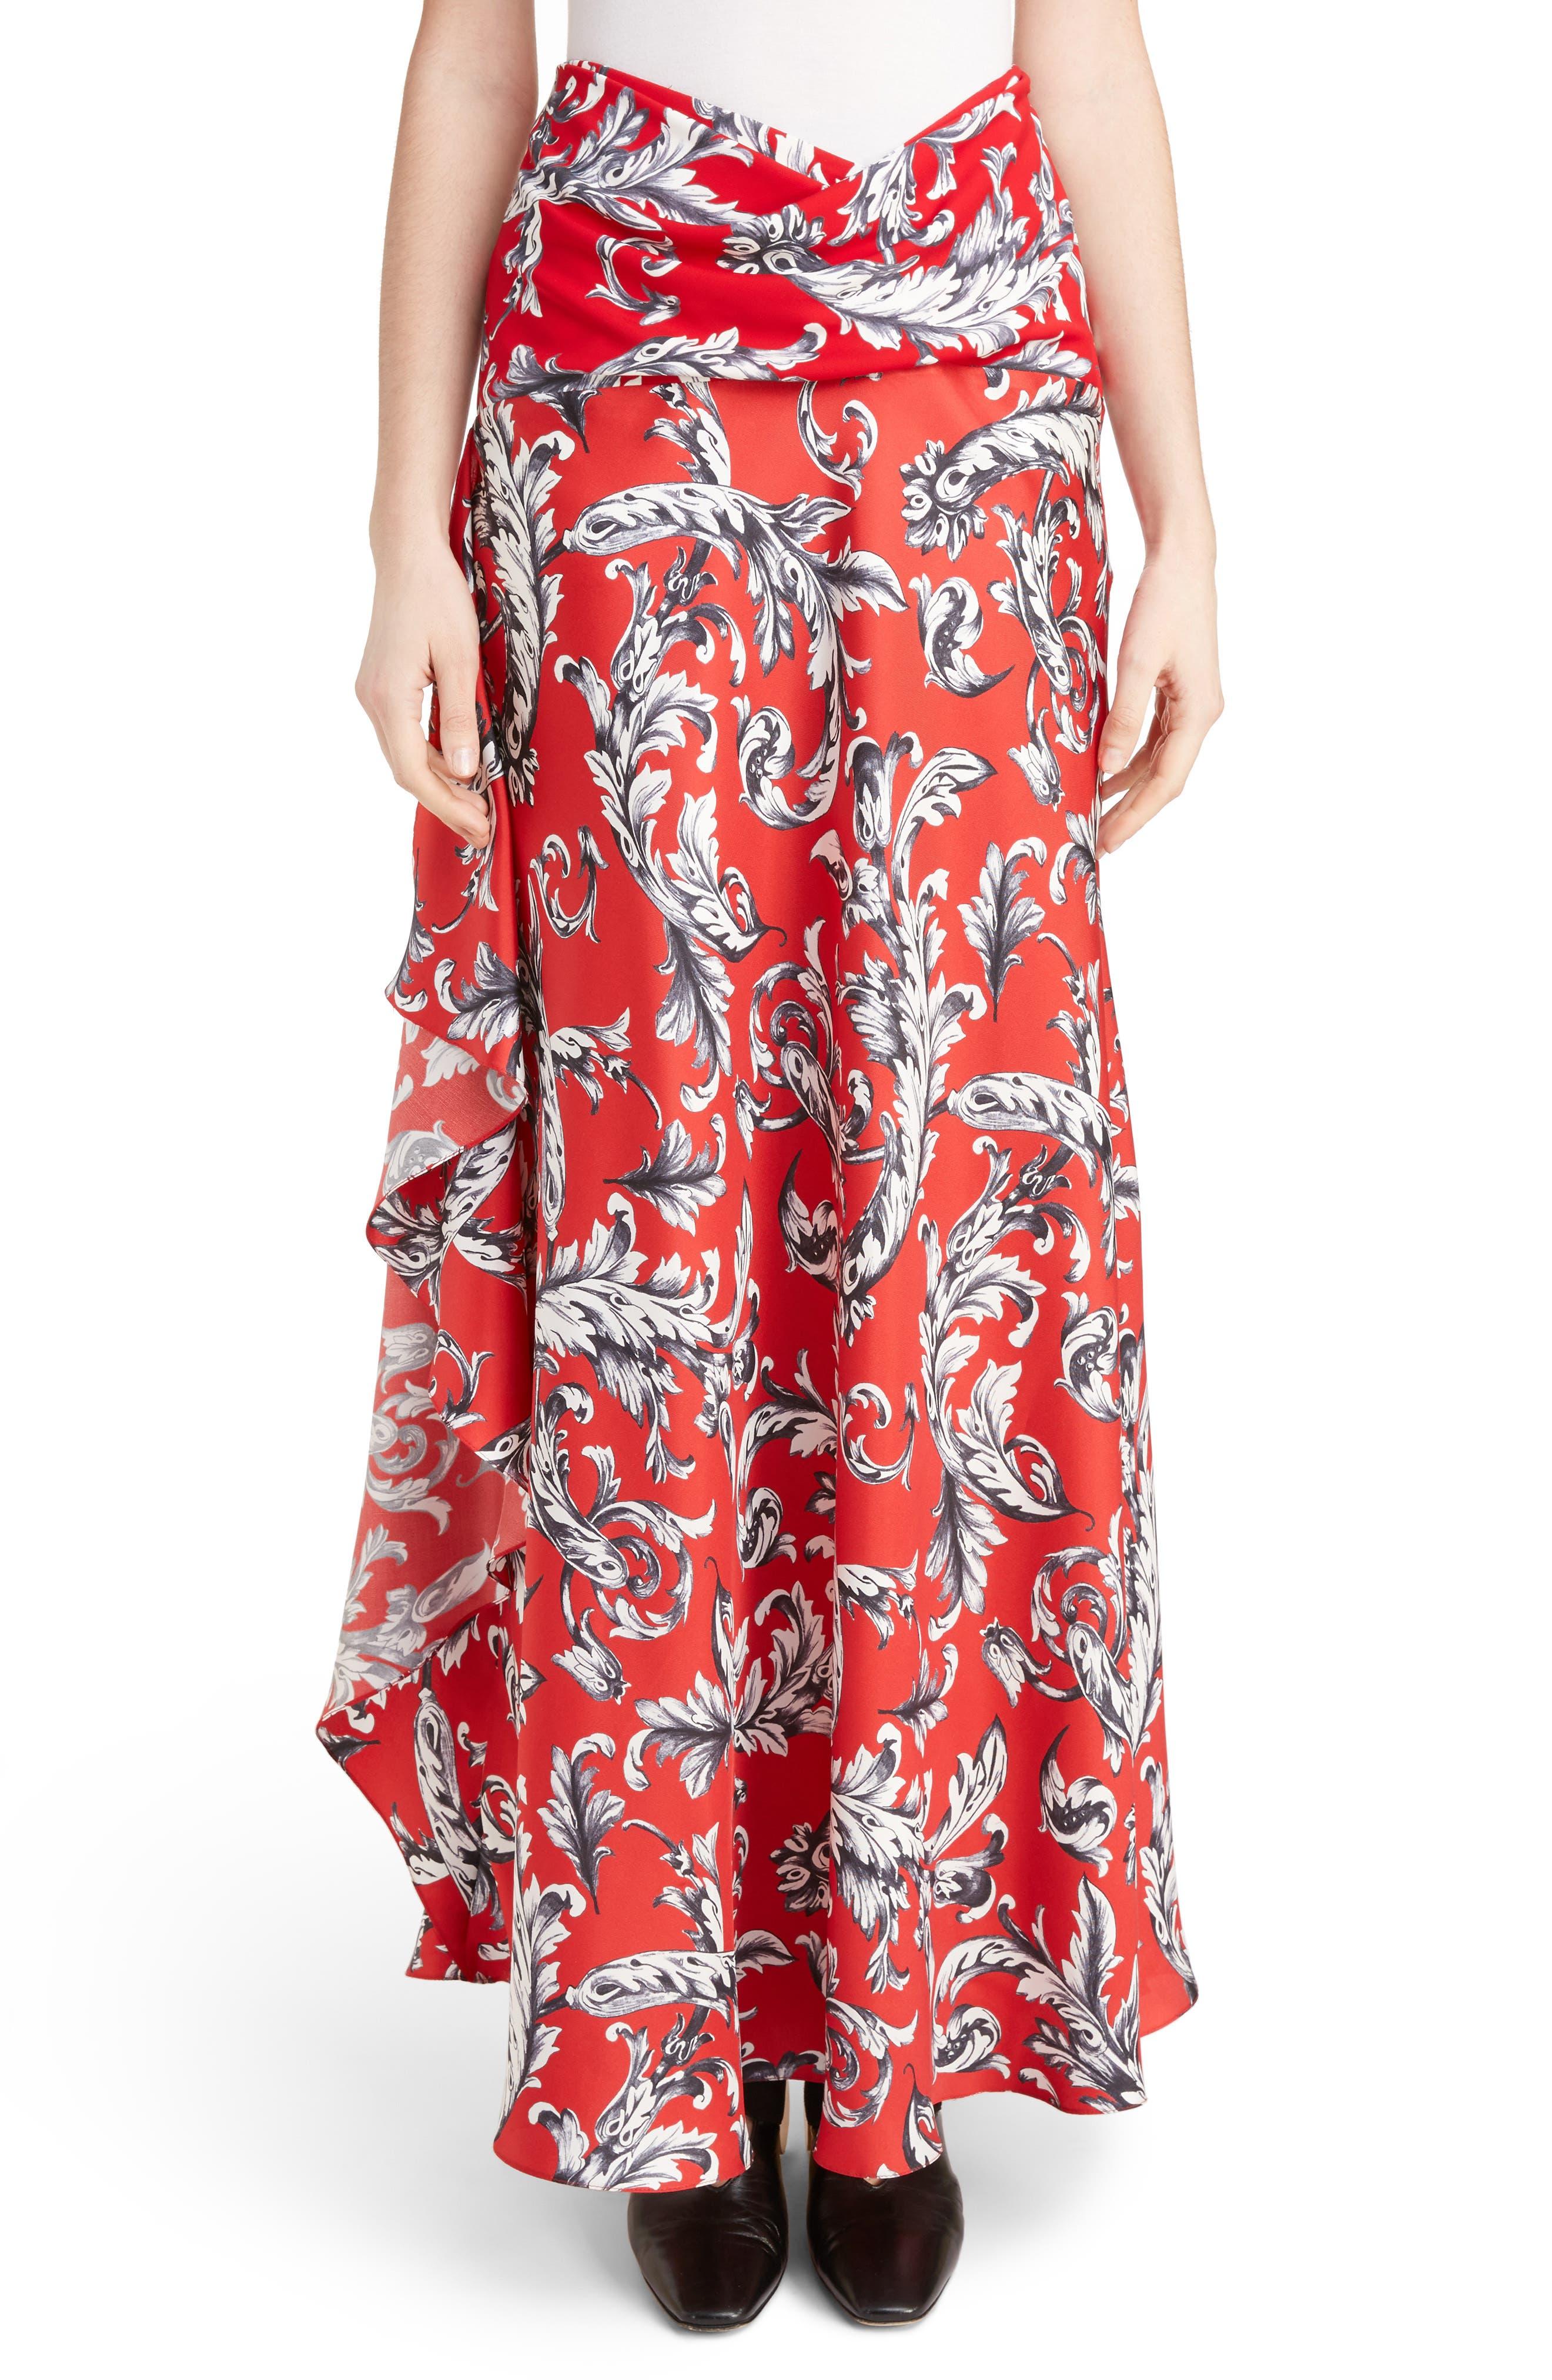 J.W.ANDERSON Filigree Print Asymmetrical Maxi Skirt,                             Main thumbnail 1, color,